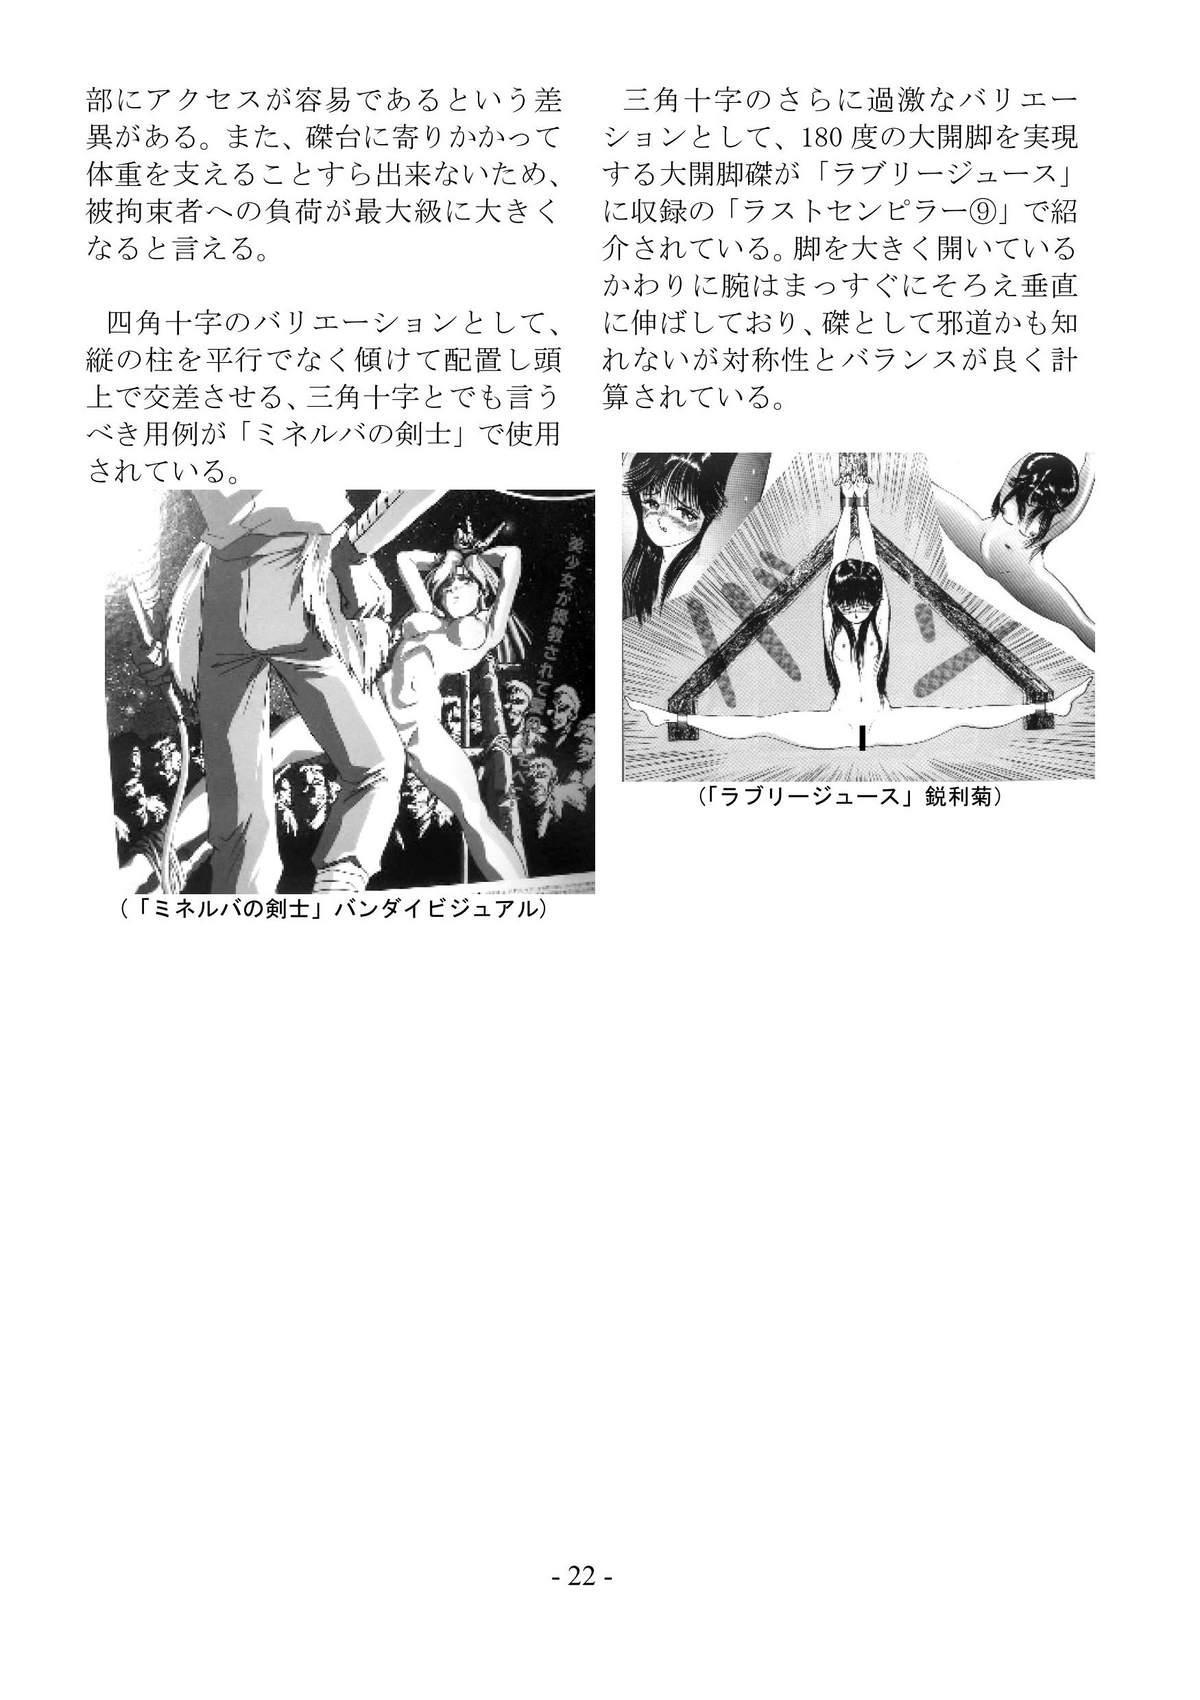 encyclopedia of crucifixion 22